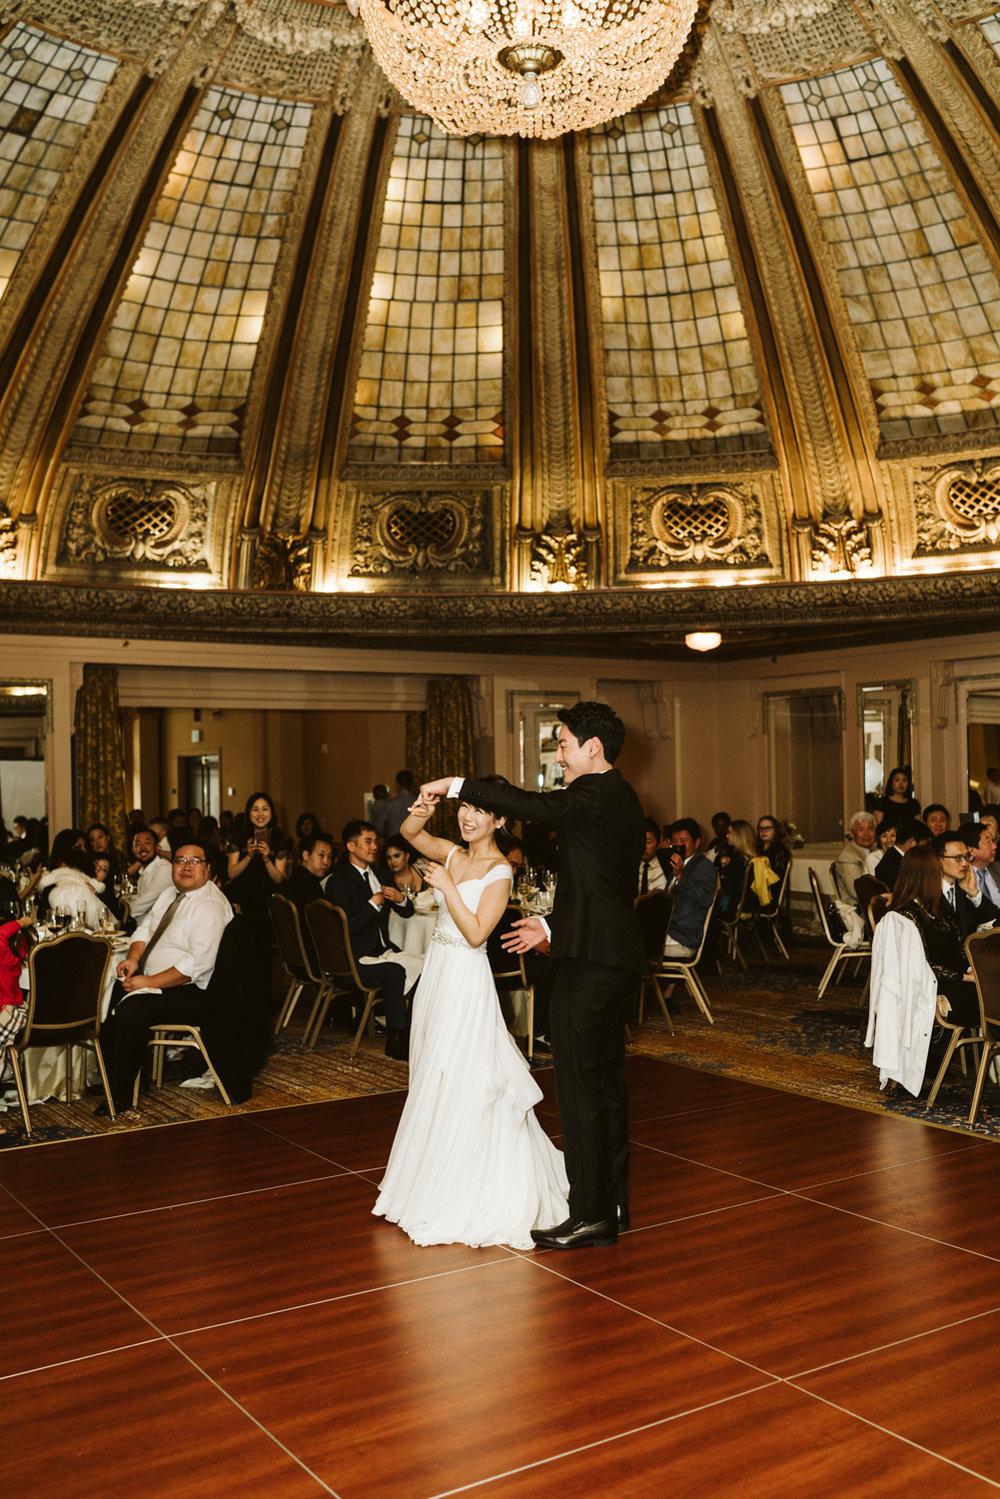 April Yentas Photography - Kristen & Jeff Wedding-38.jpg